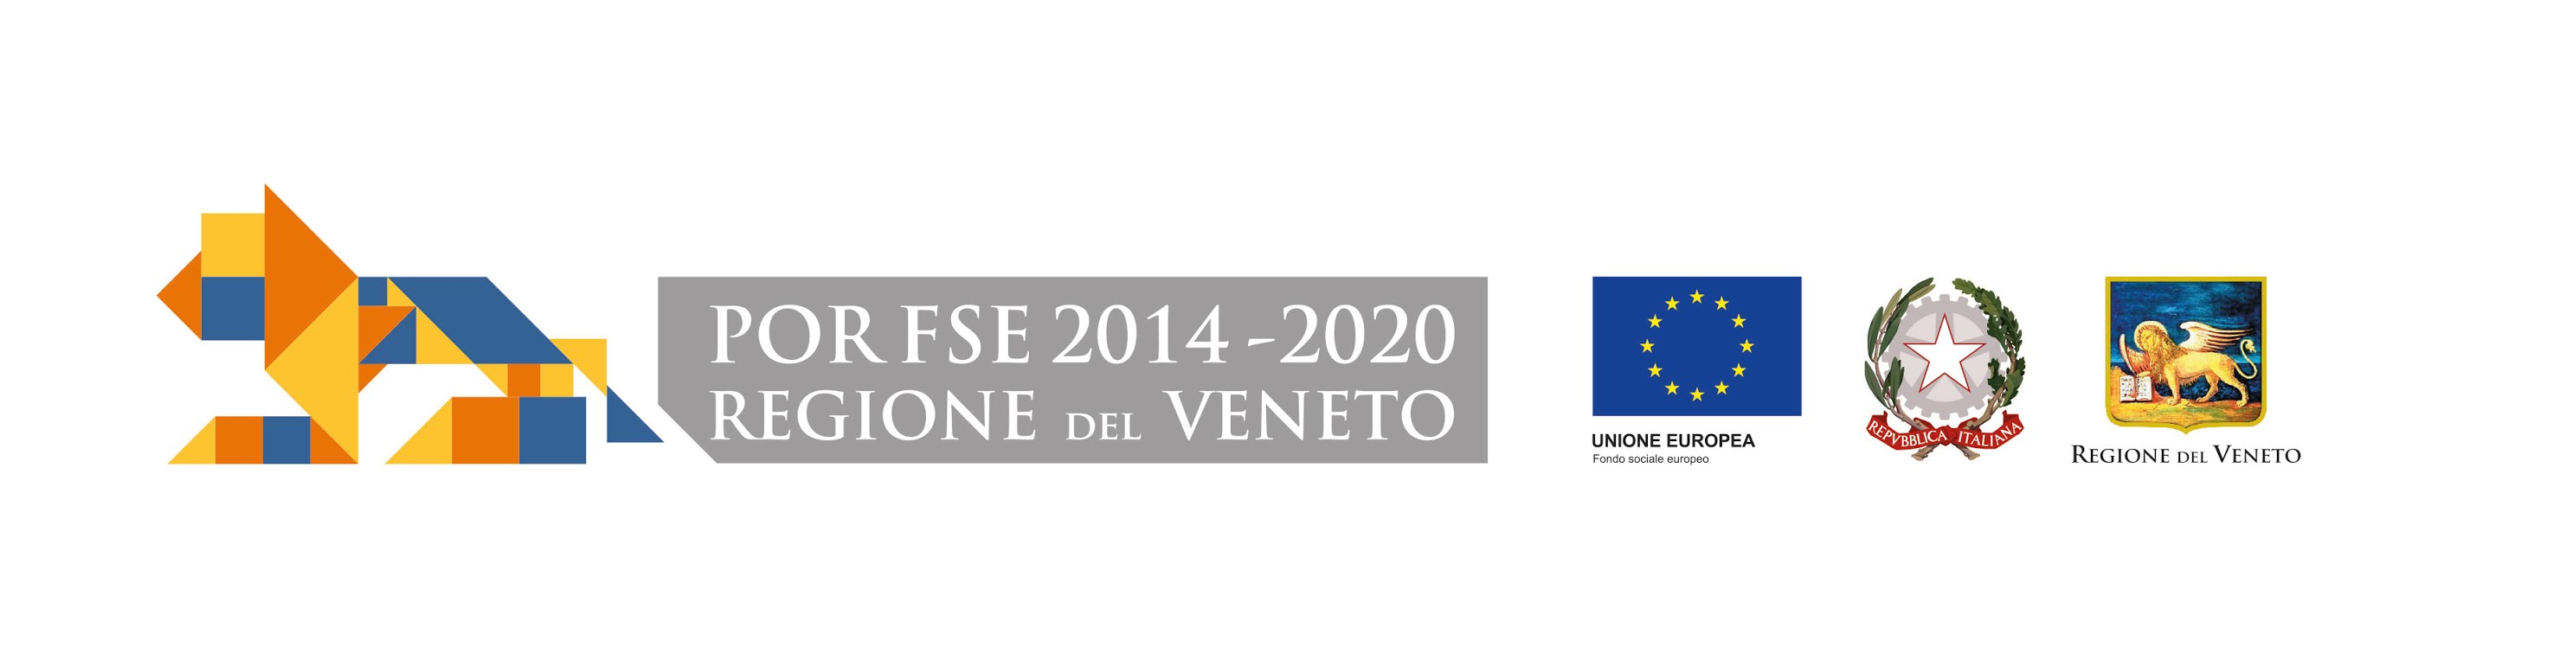 Regione Veneto FSE 2014_2020